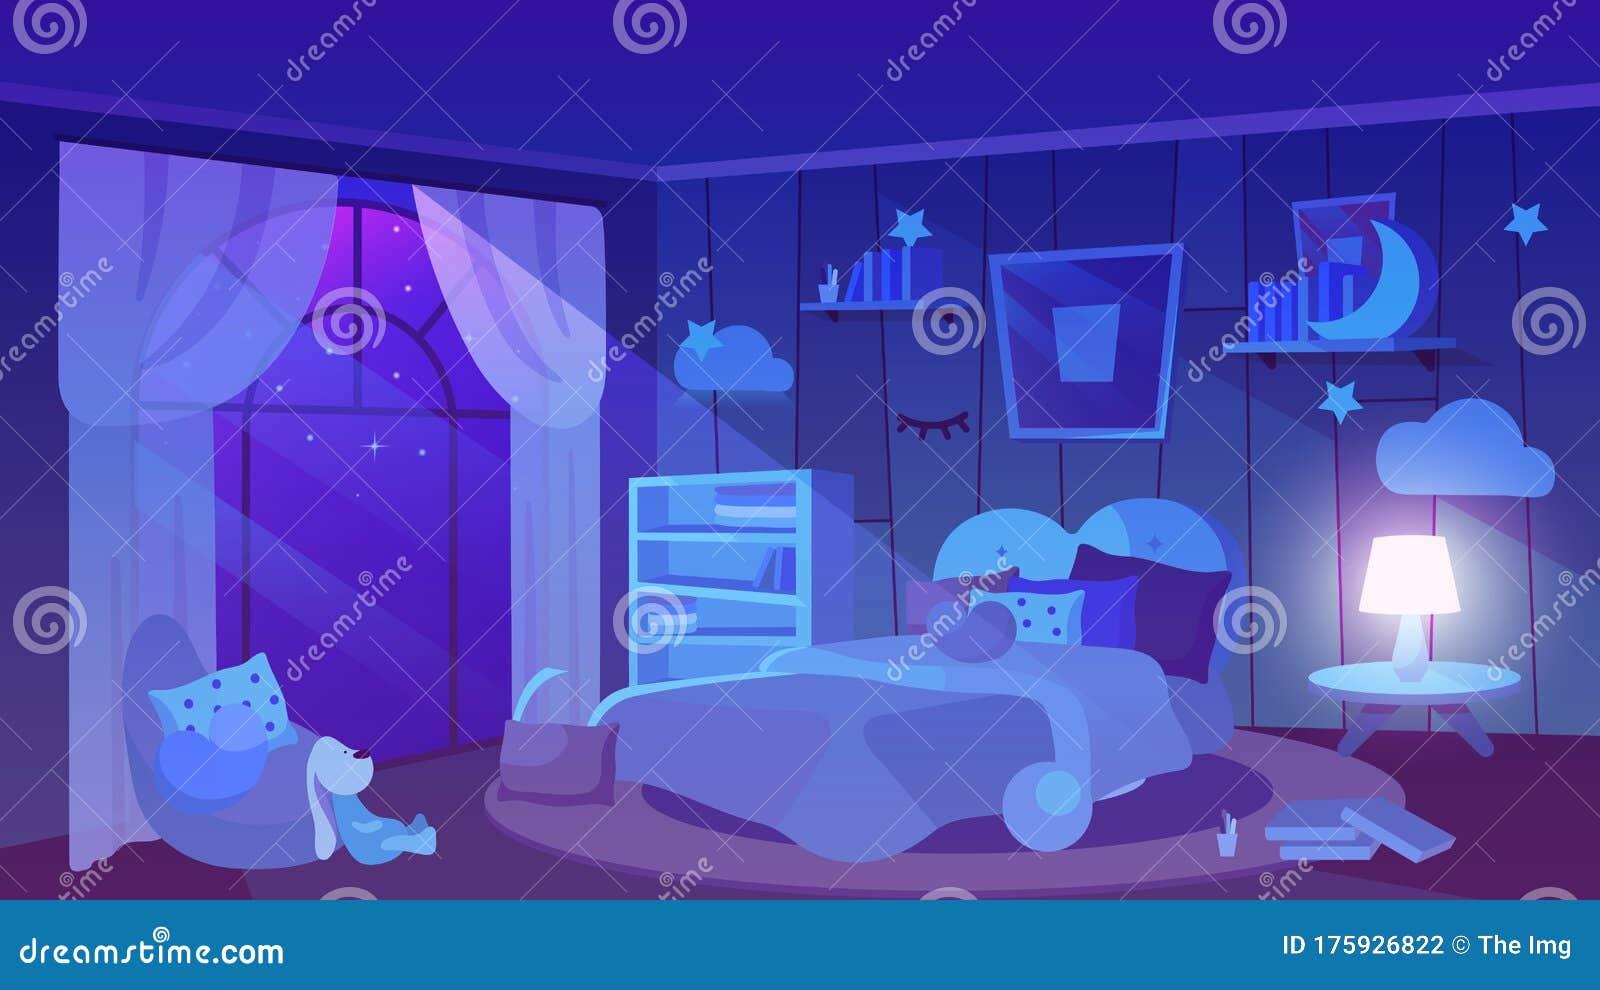 Image of: Kids Bedroom Stock Illustrations 4 164 Kids Bedroom Stock Illustrations Vectors Clipart Dreamstime